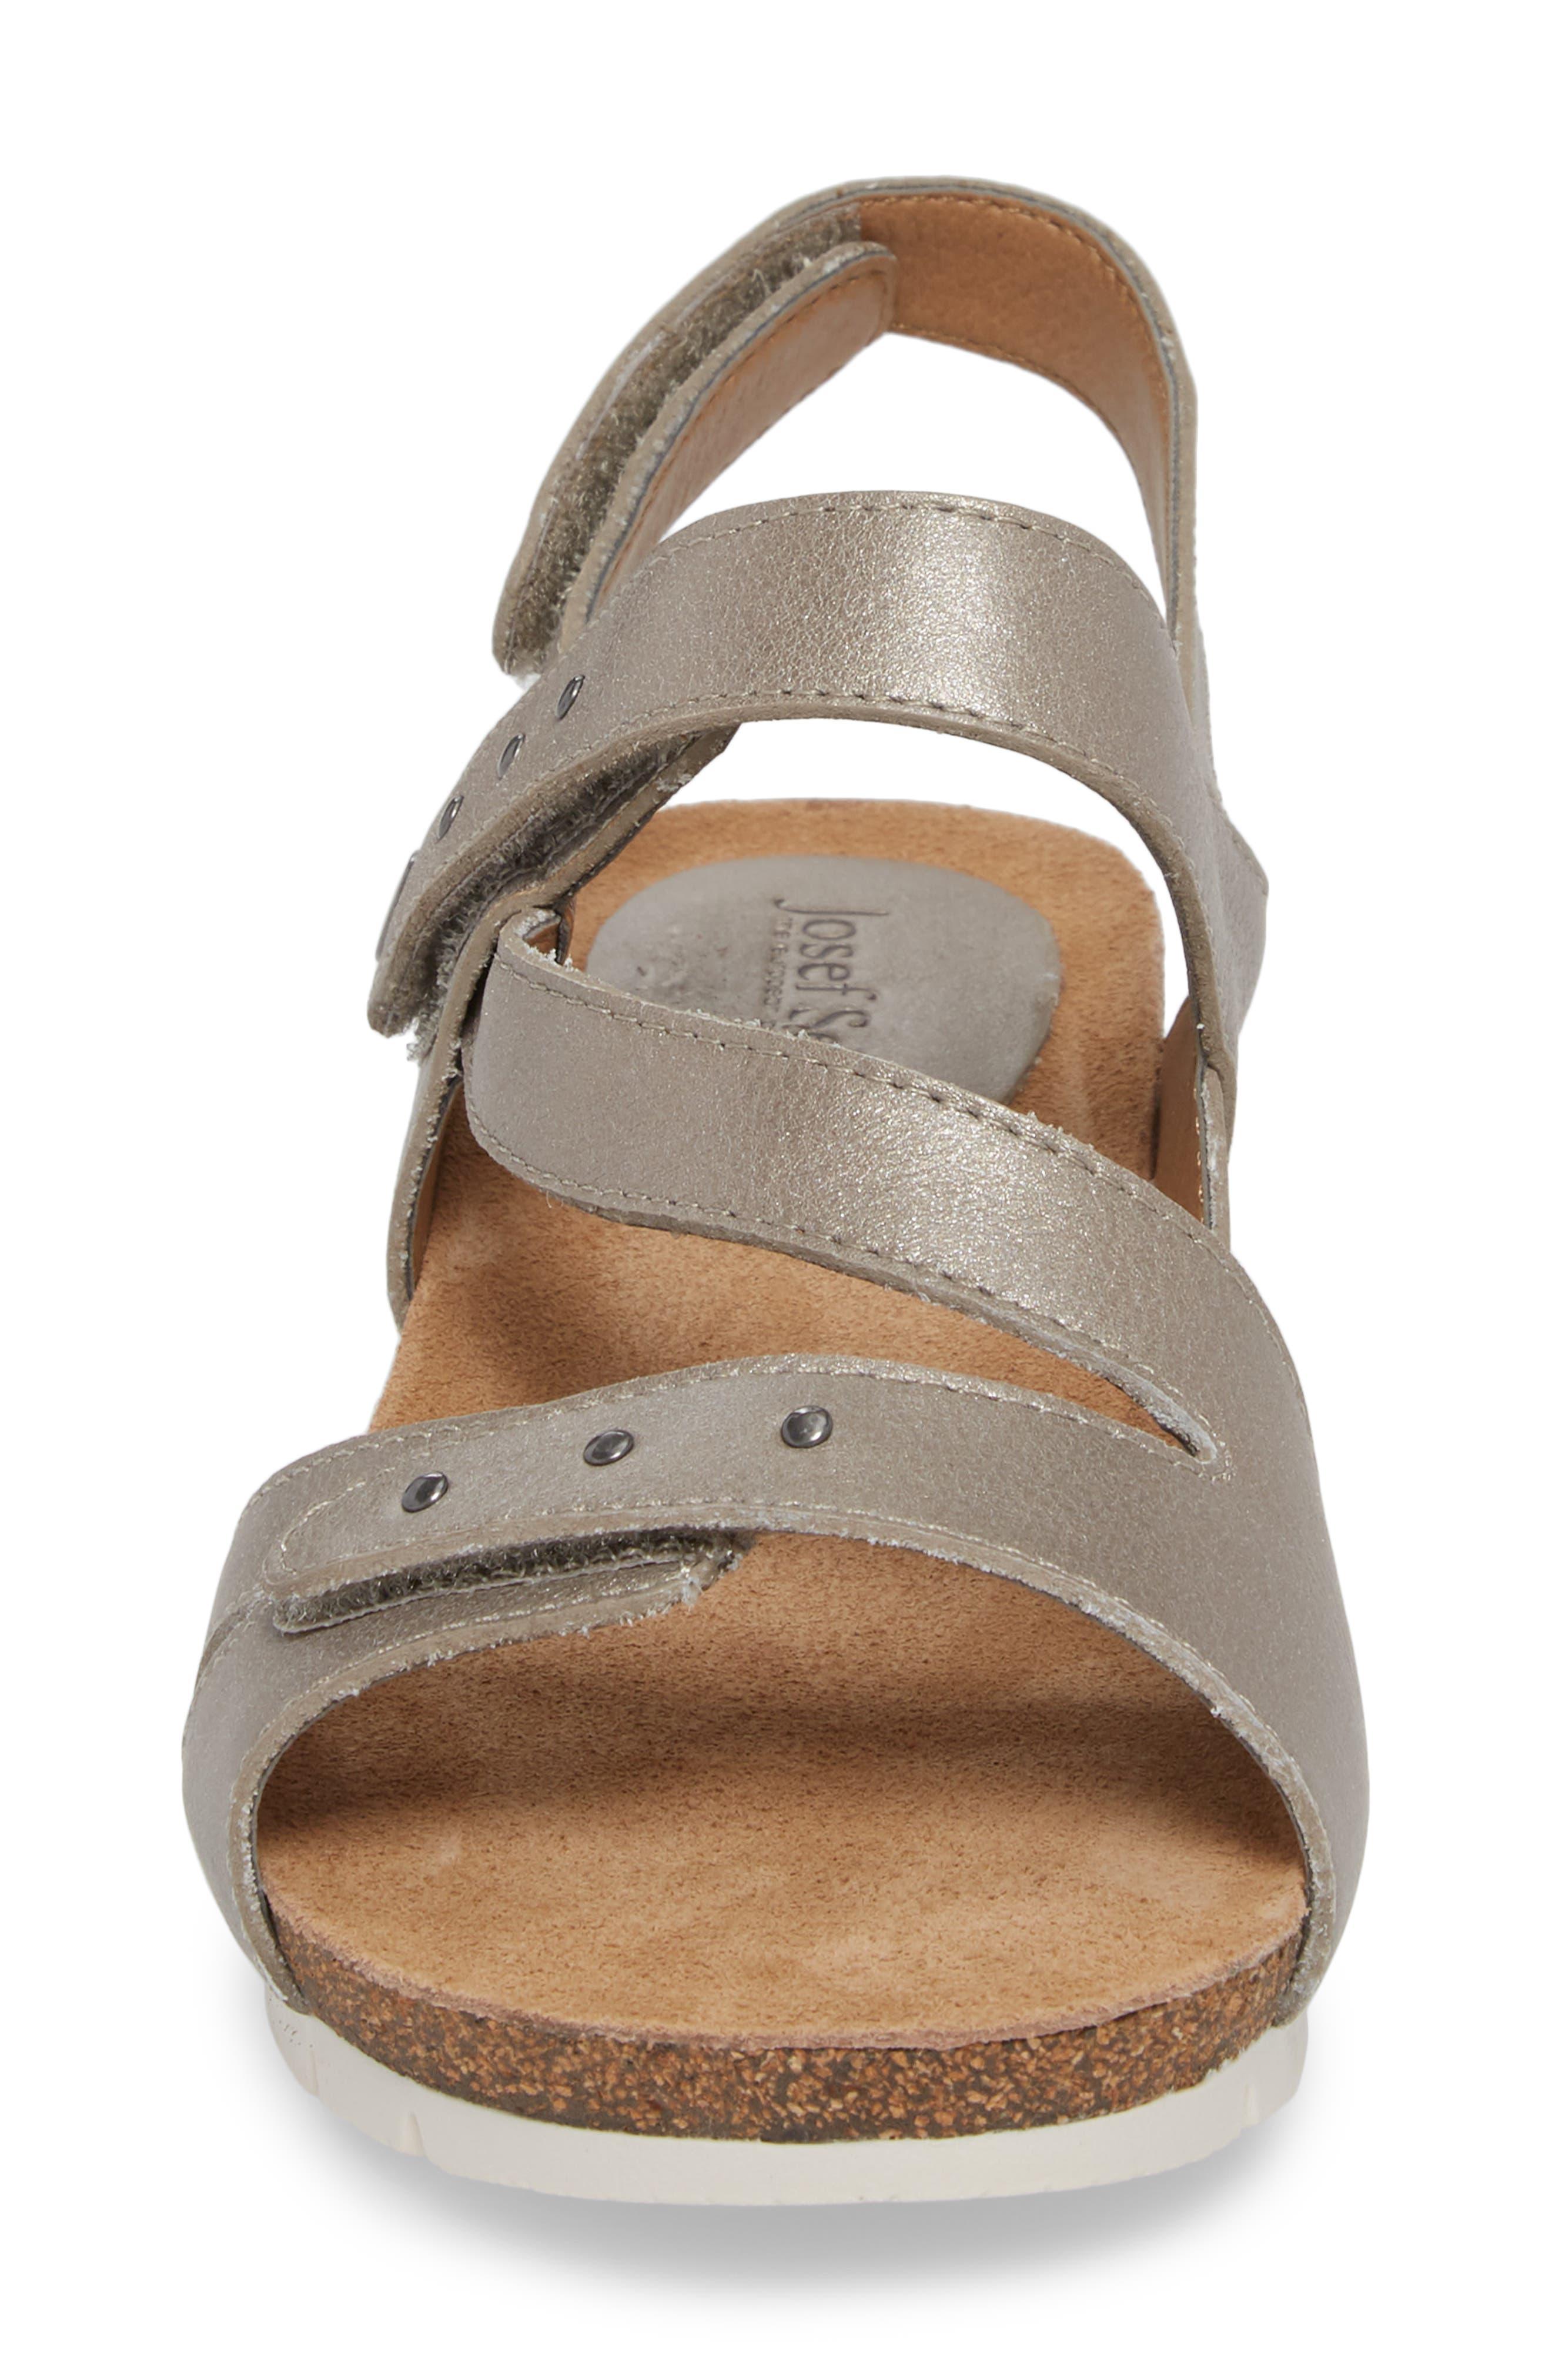 Hailey 33 Sandal,                             Alternate thumbnail 4, color,                             PLATINUM LEATHER